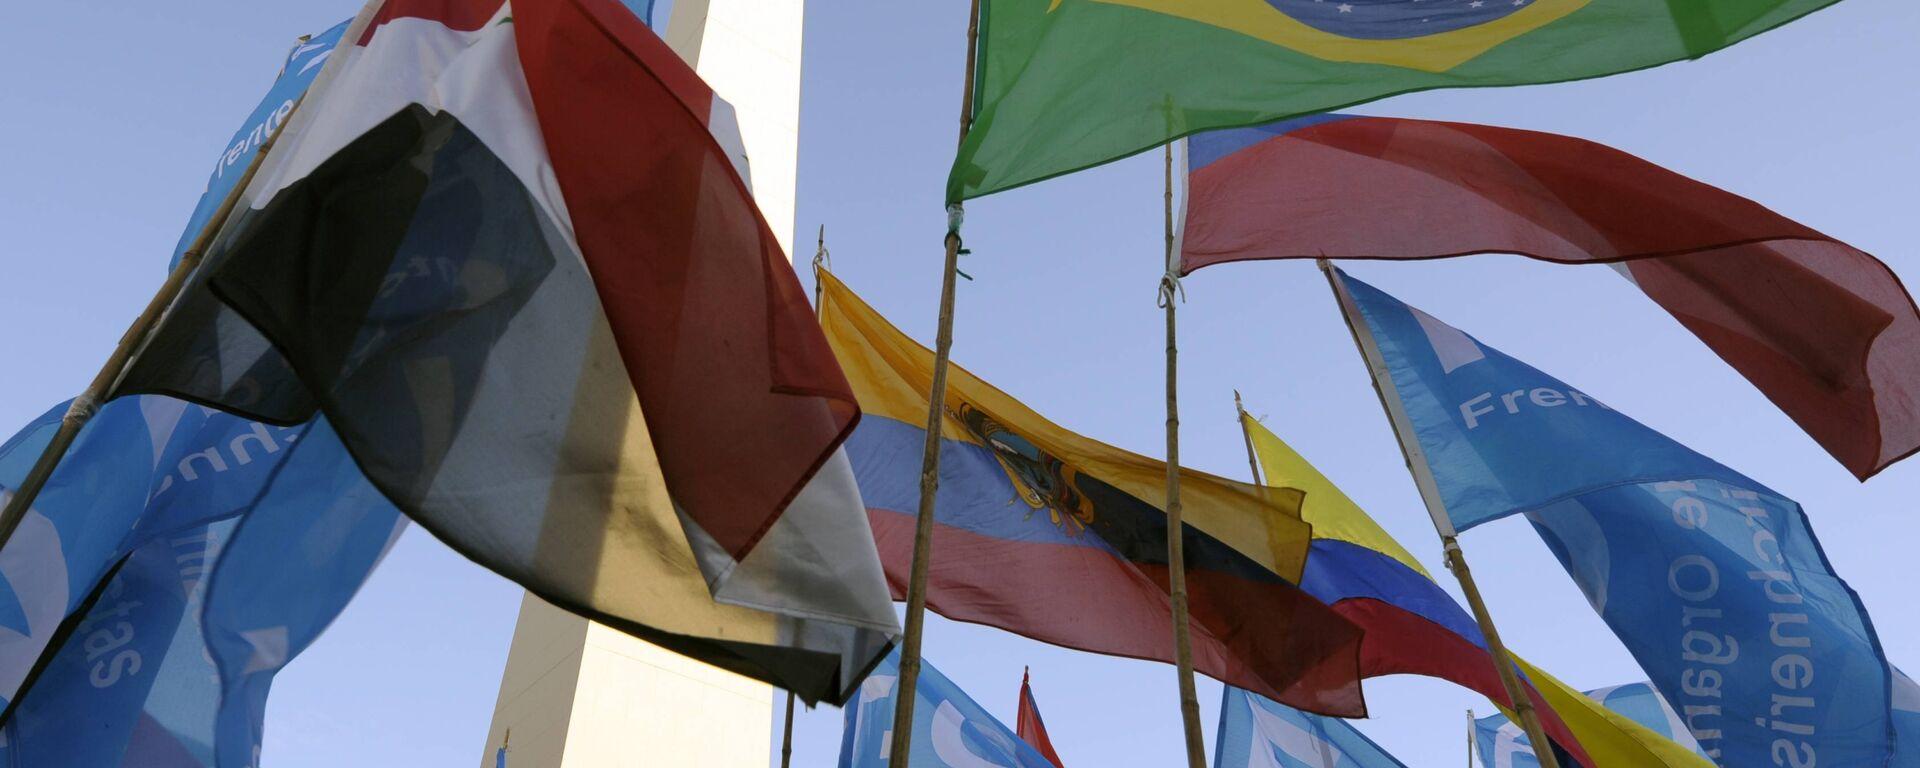 Banderas de Mercosur  - Sputnik Mundo, 1920, 24.03.2021